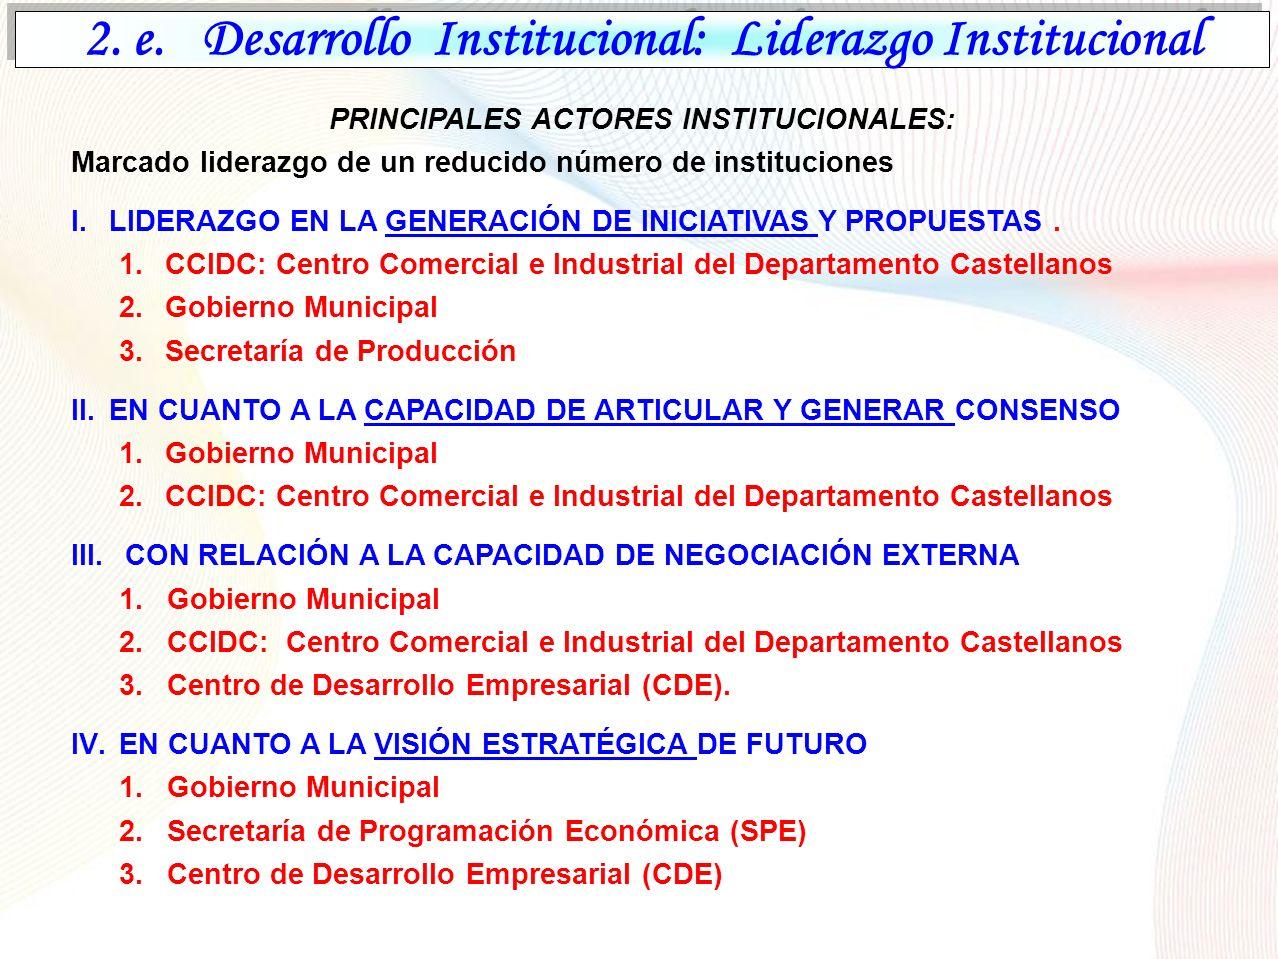 2. e. Desarrollo Institucional: Liderazgo Institucional